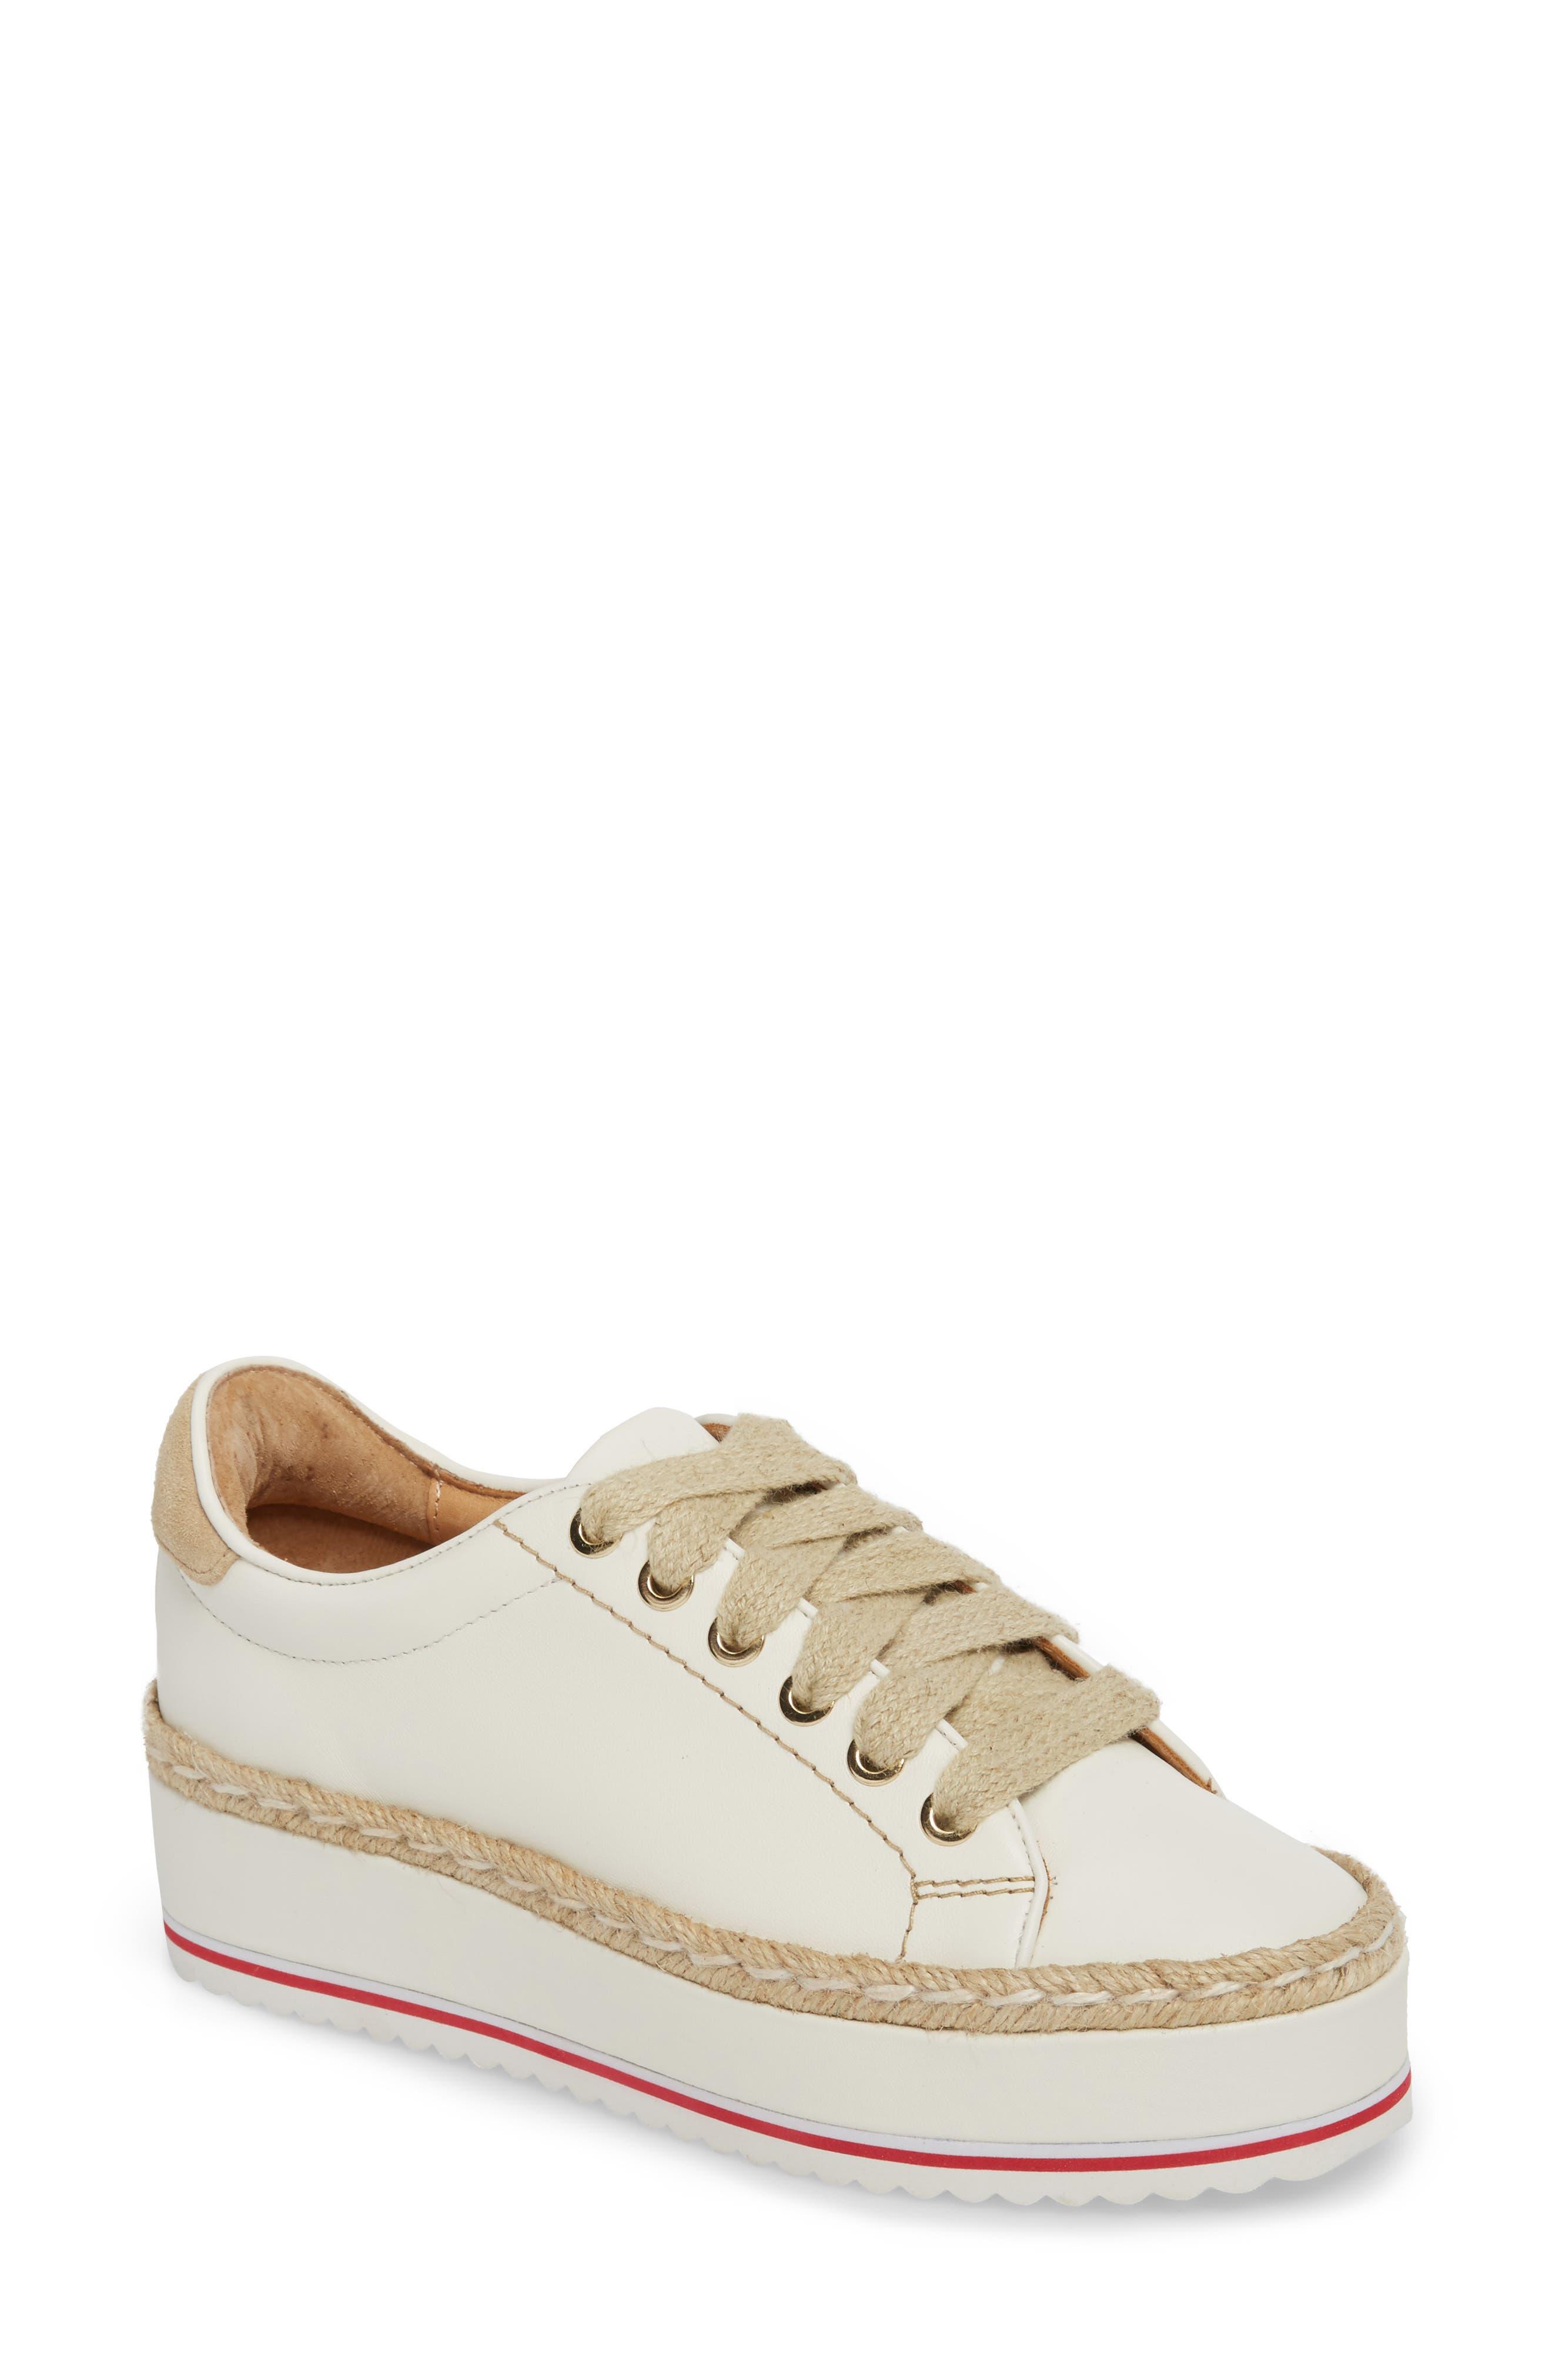 Alternate Image 1 Selected - Joie Dabnis Espadrille Platform Sneaker (Women)